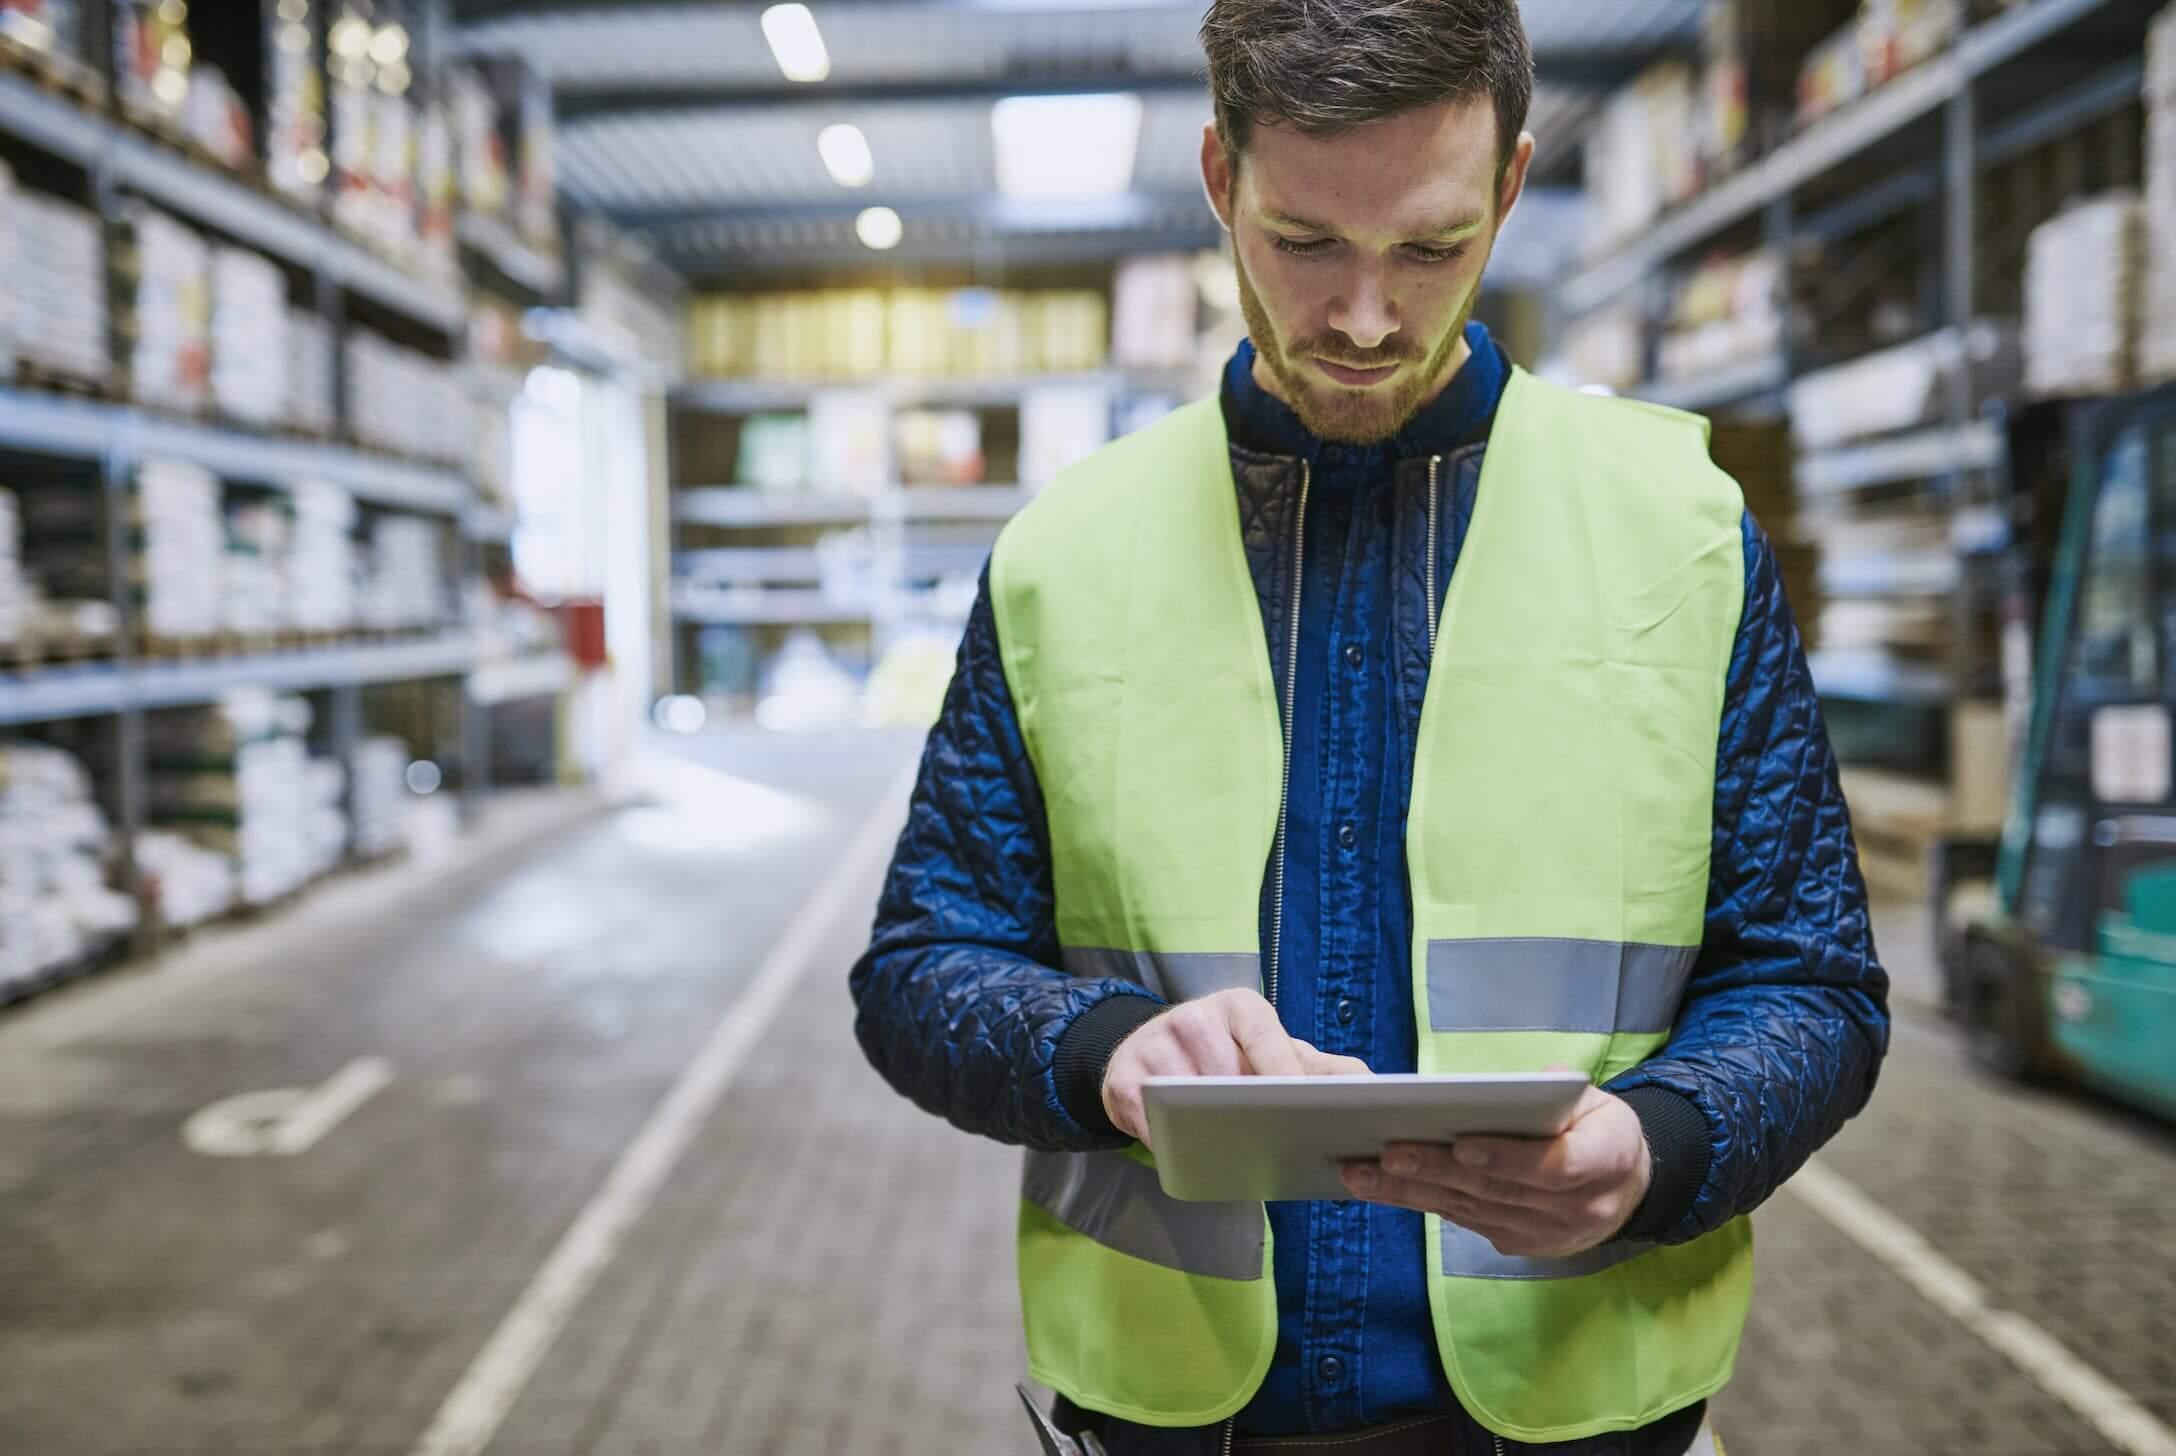 staffing industry redefine agile workforces